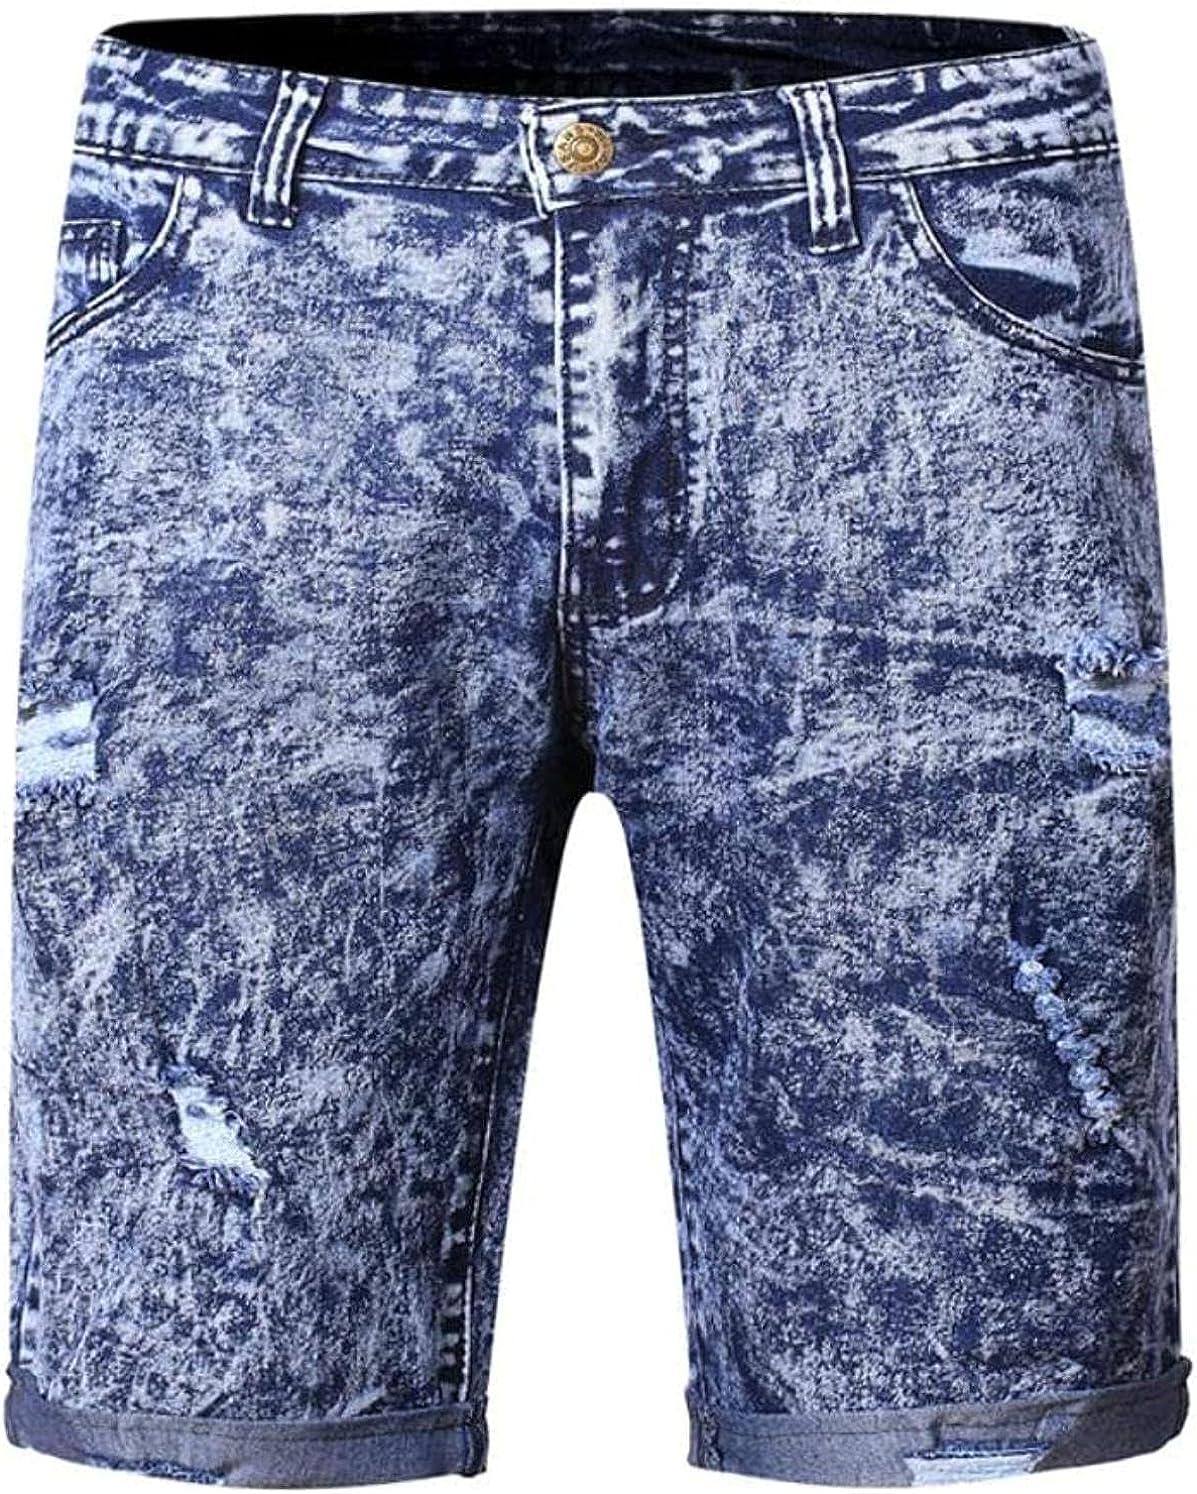 LLTT Mens Hardwearing Comfortable Trousers Summer Thin Denim Shorts with Holes